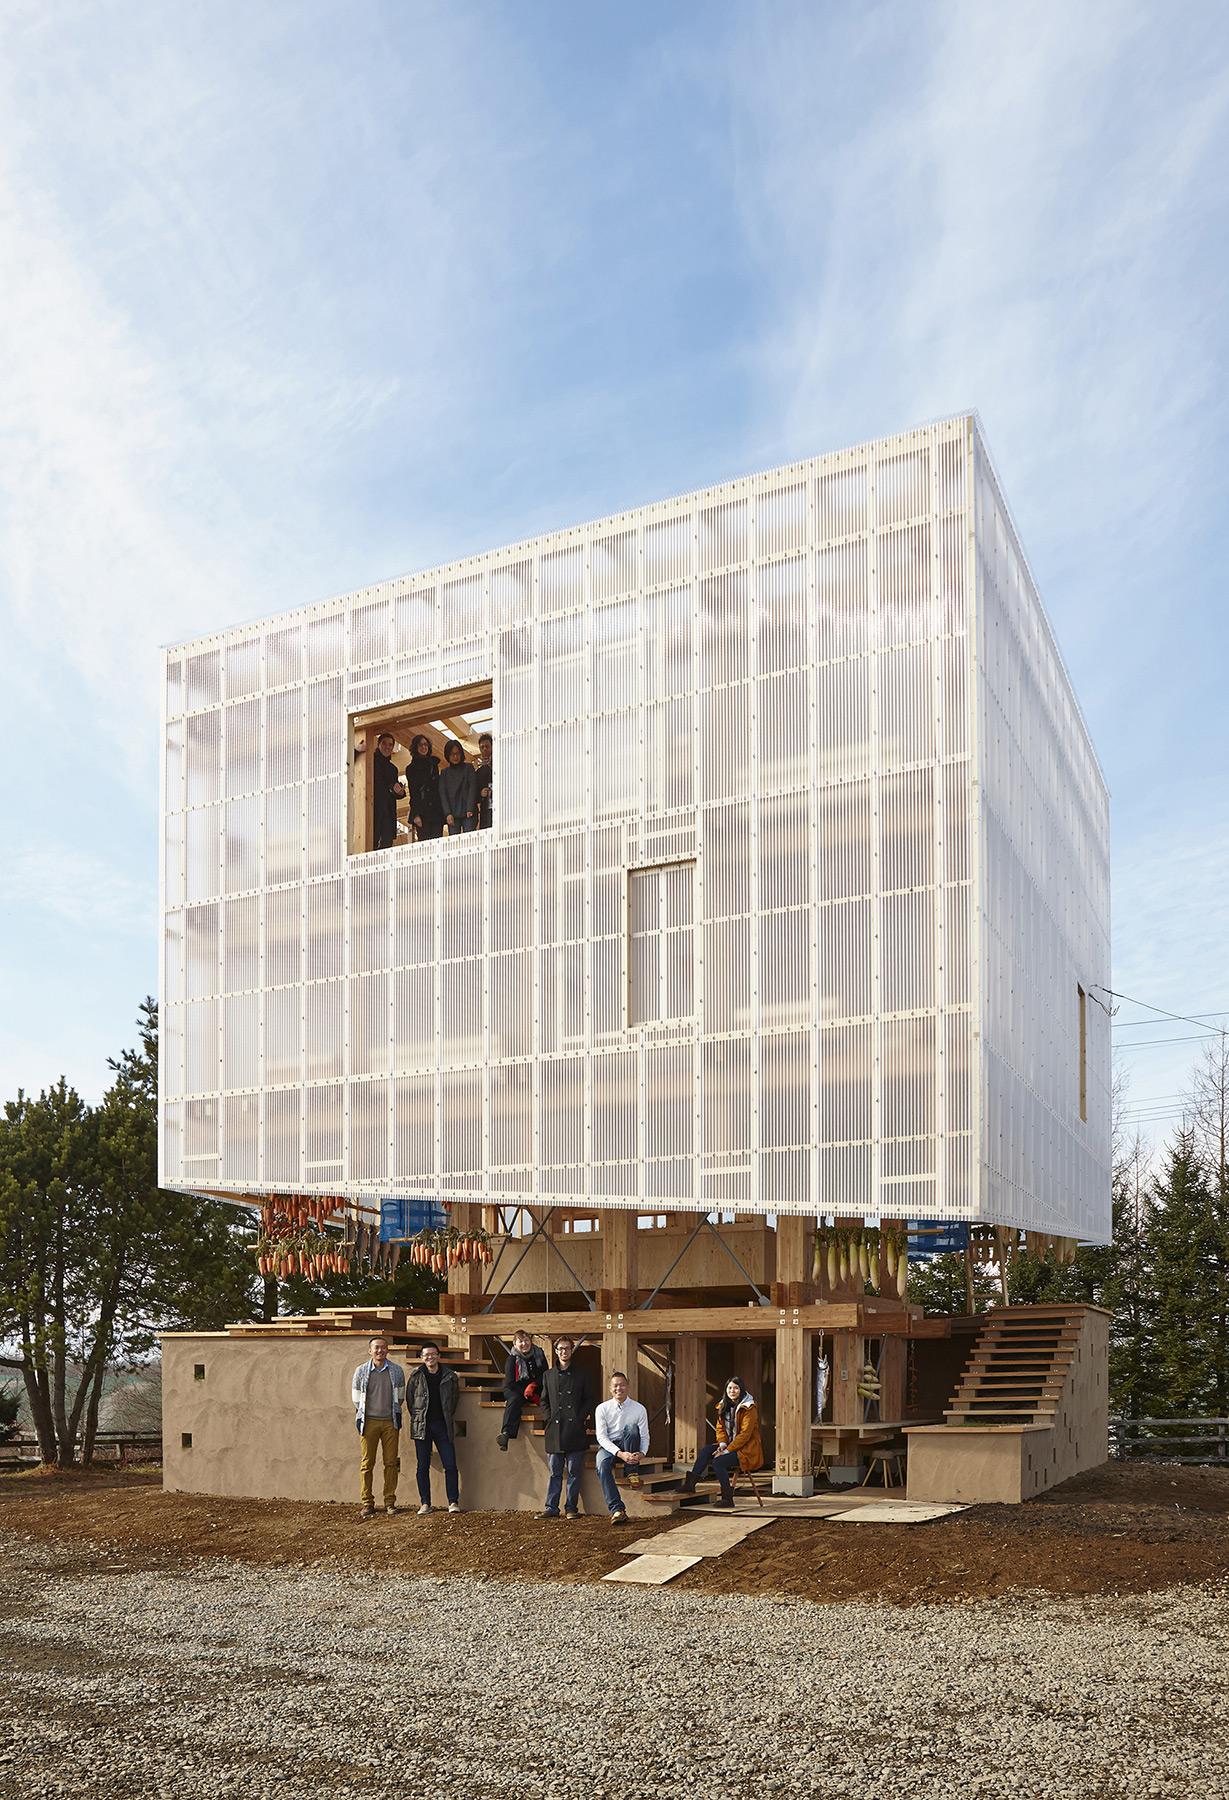 Nest We Grow / College of Environmental Design & Kengo Kuma & Associates (40)